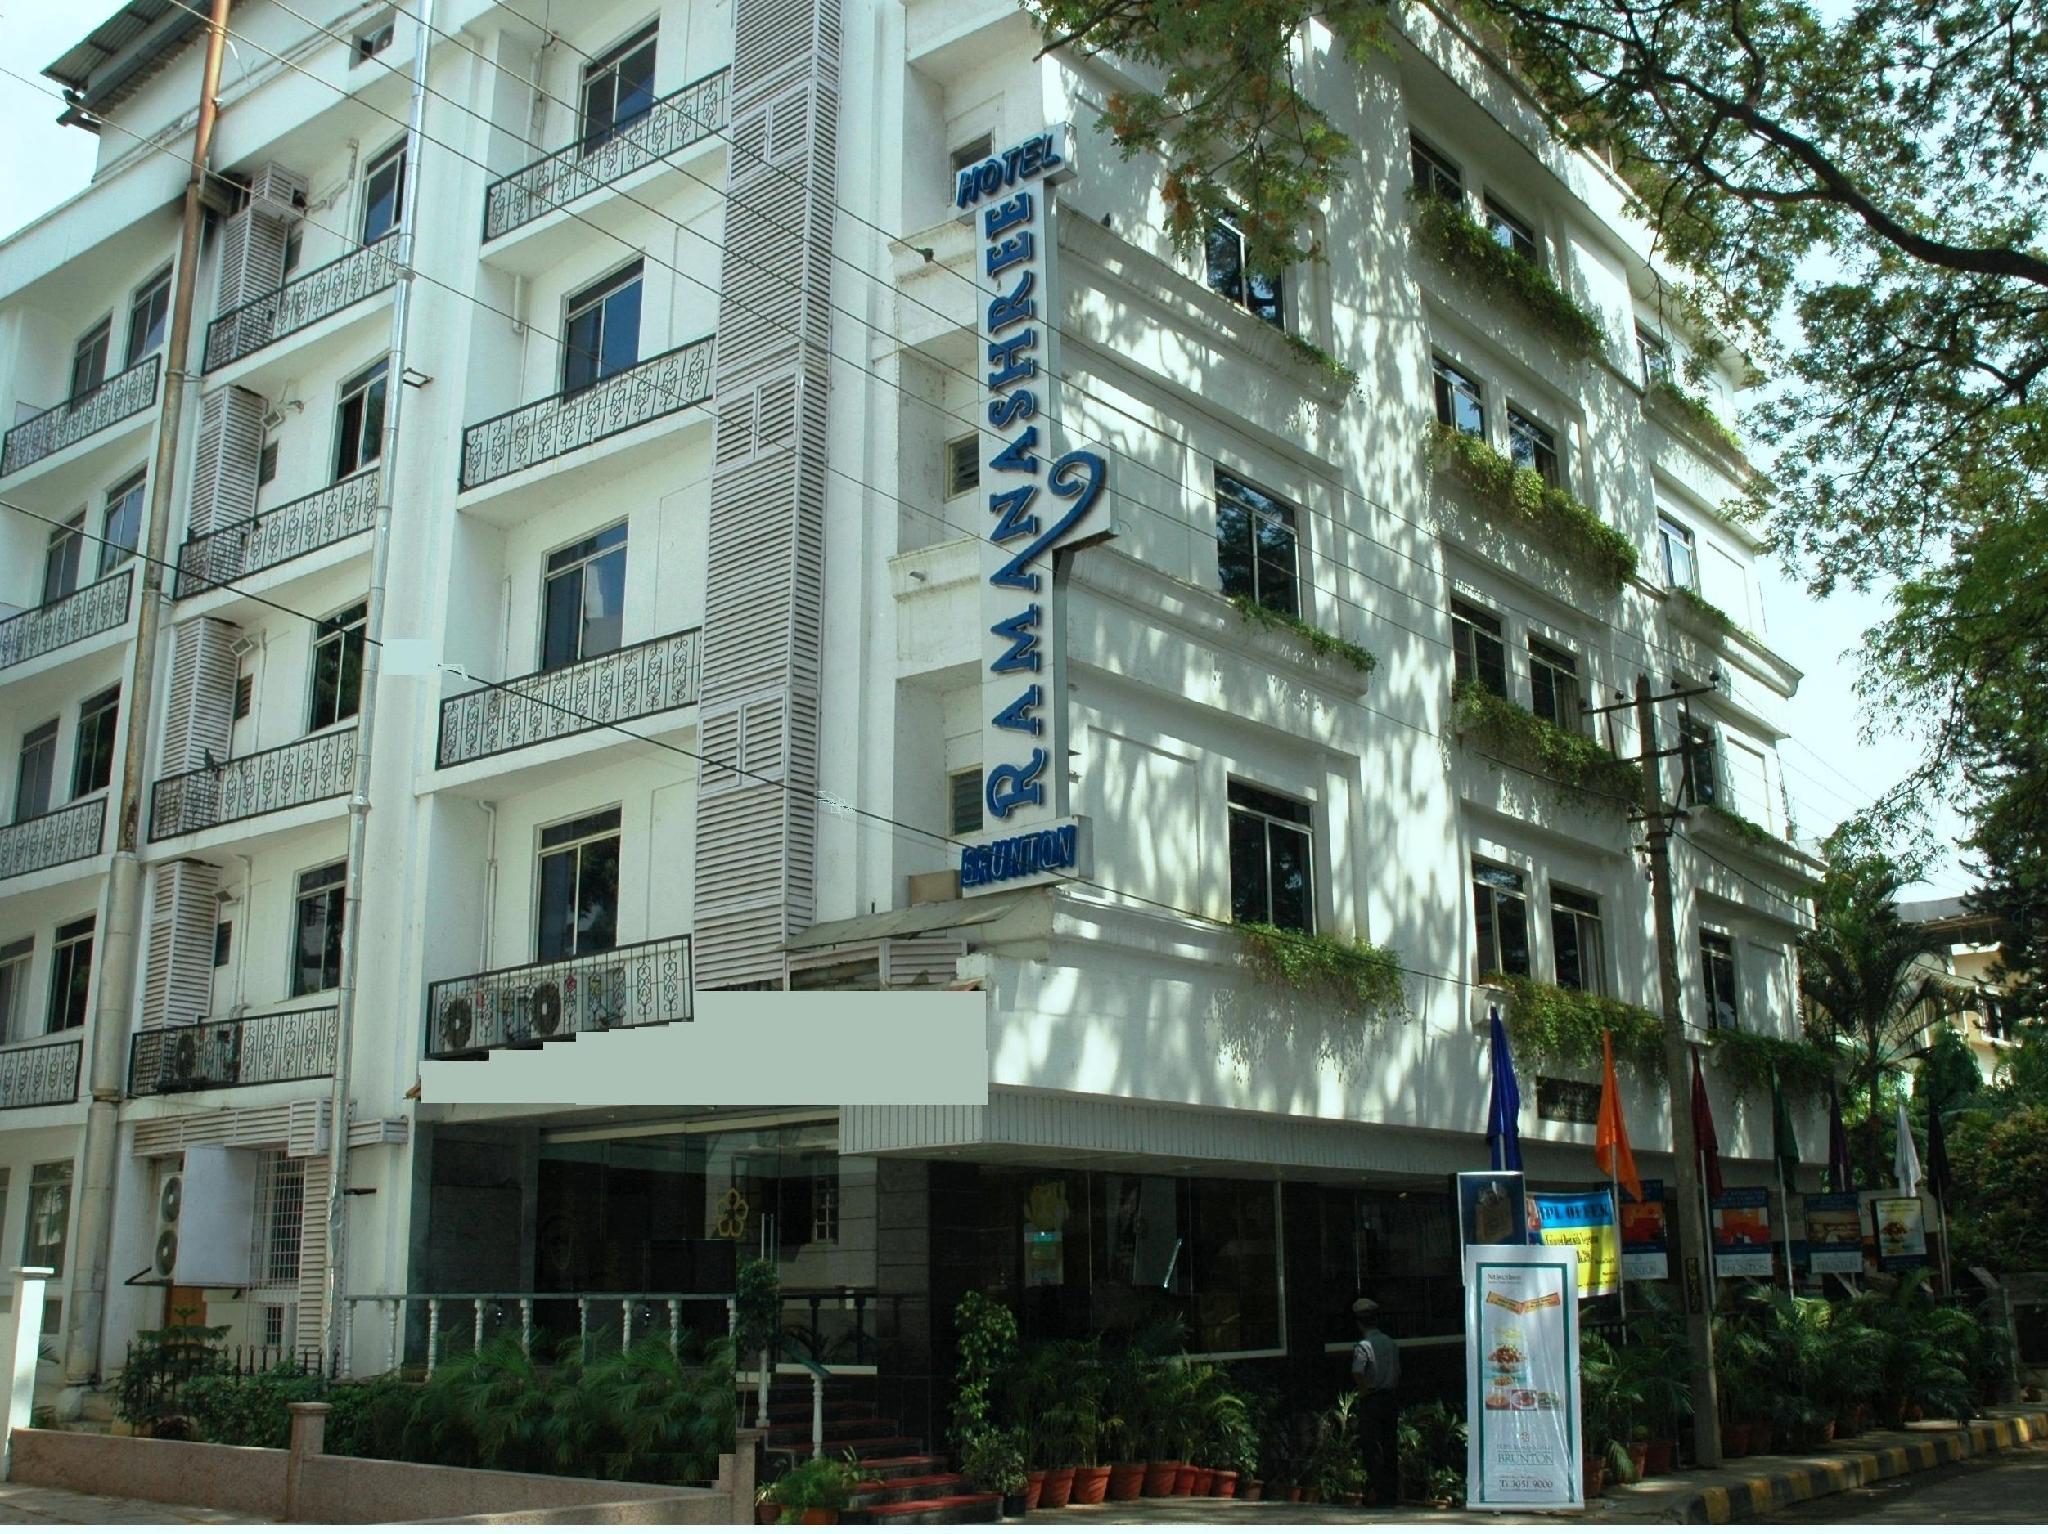 Ramanashree Brunton Hotel - Hotell och Boende i Indien i Bengaluru / Bangalore